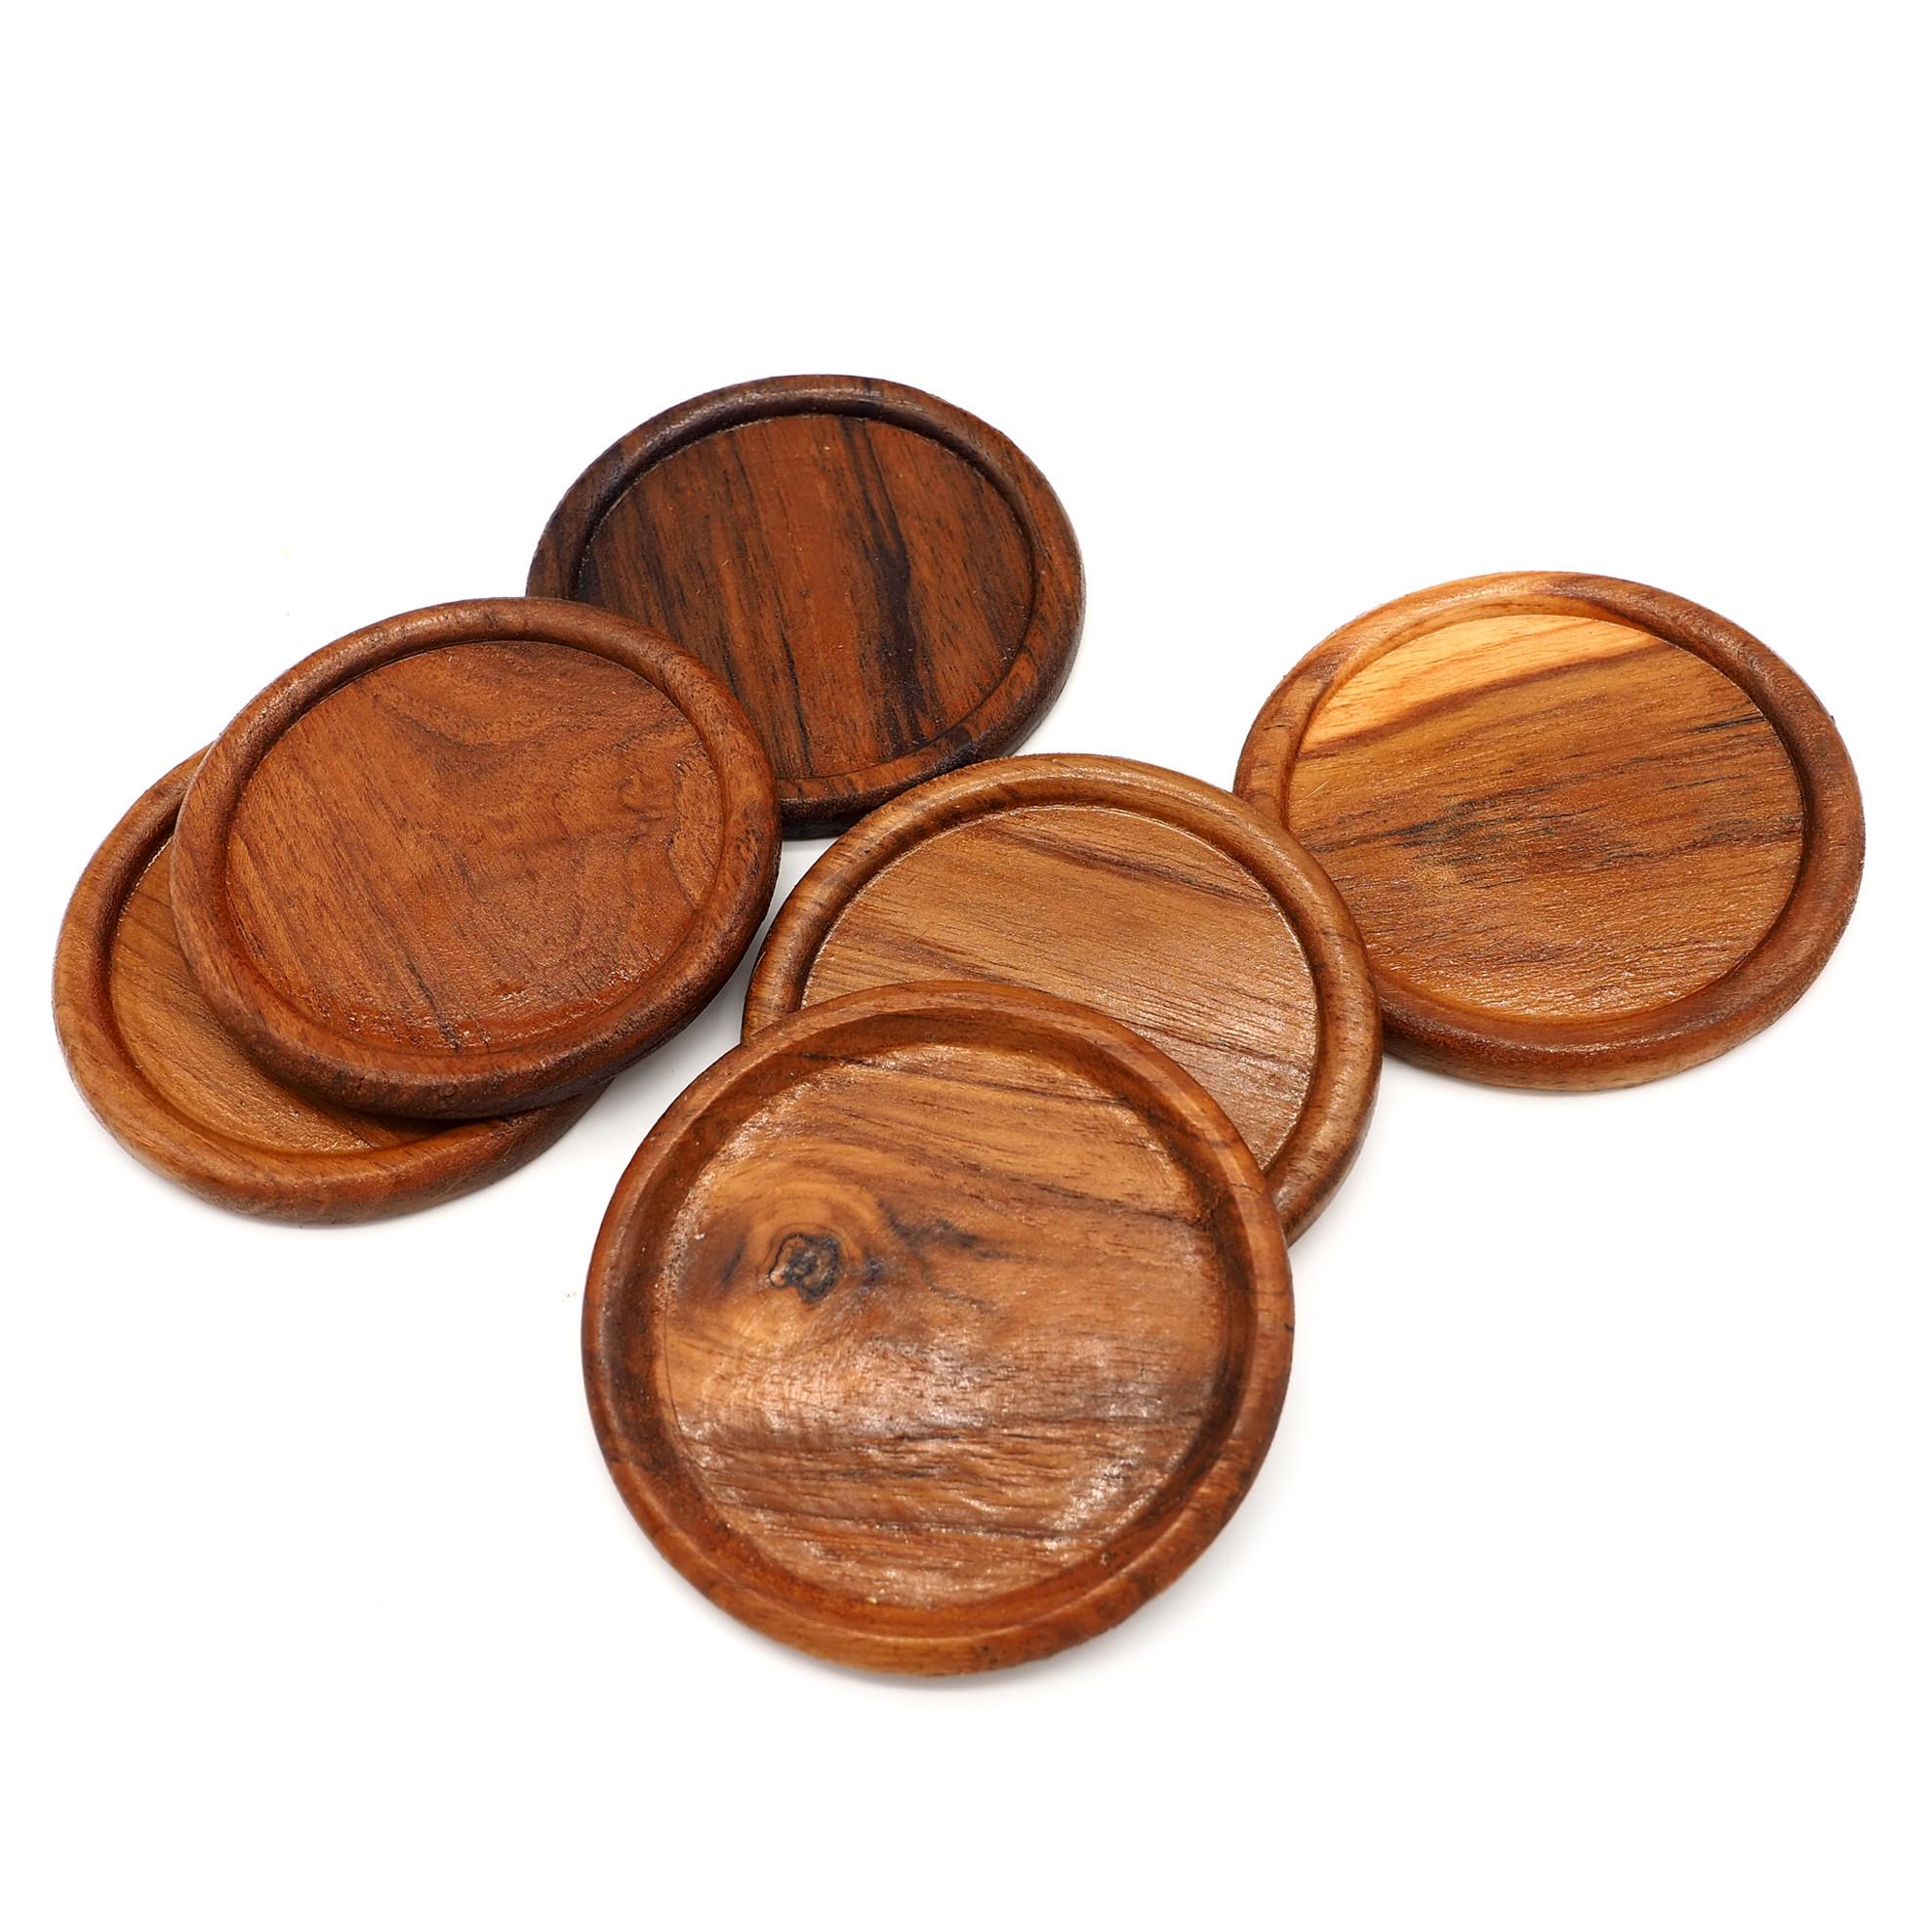 Picture of Teak Wood Coasters Set of 6, Round Shape 8.5cm